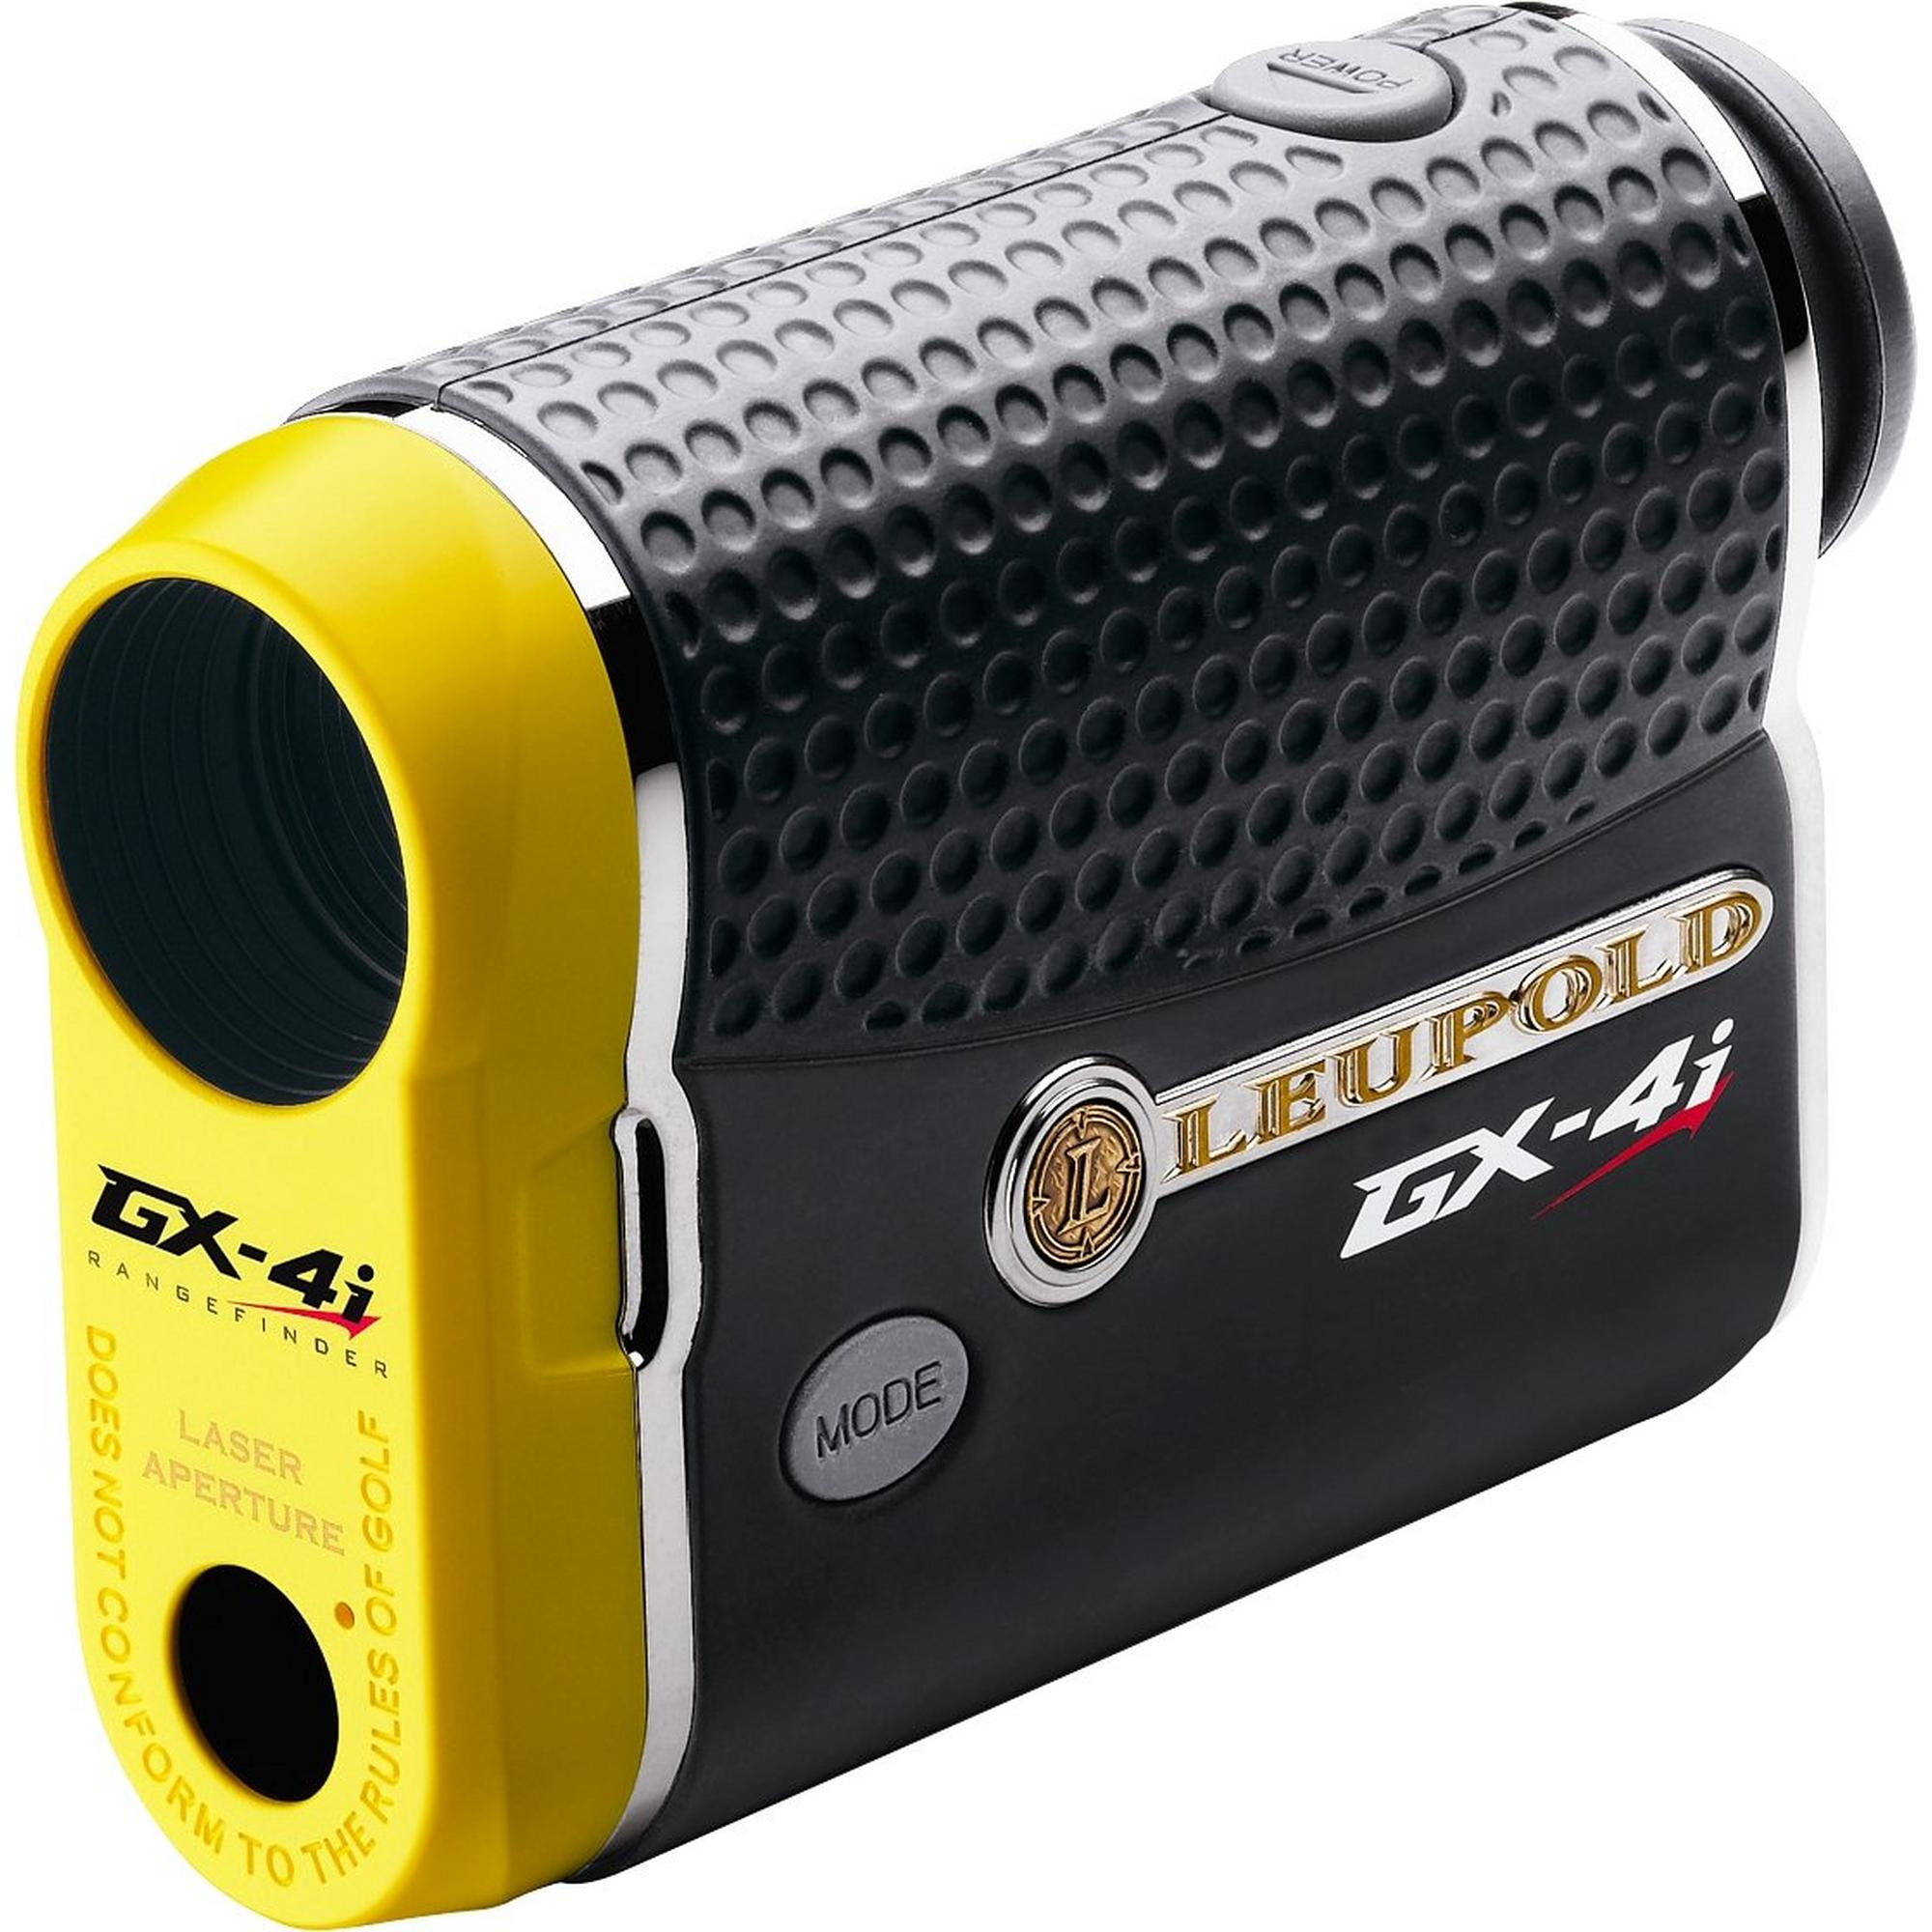 Télémètre laser GX-4i